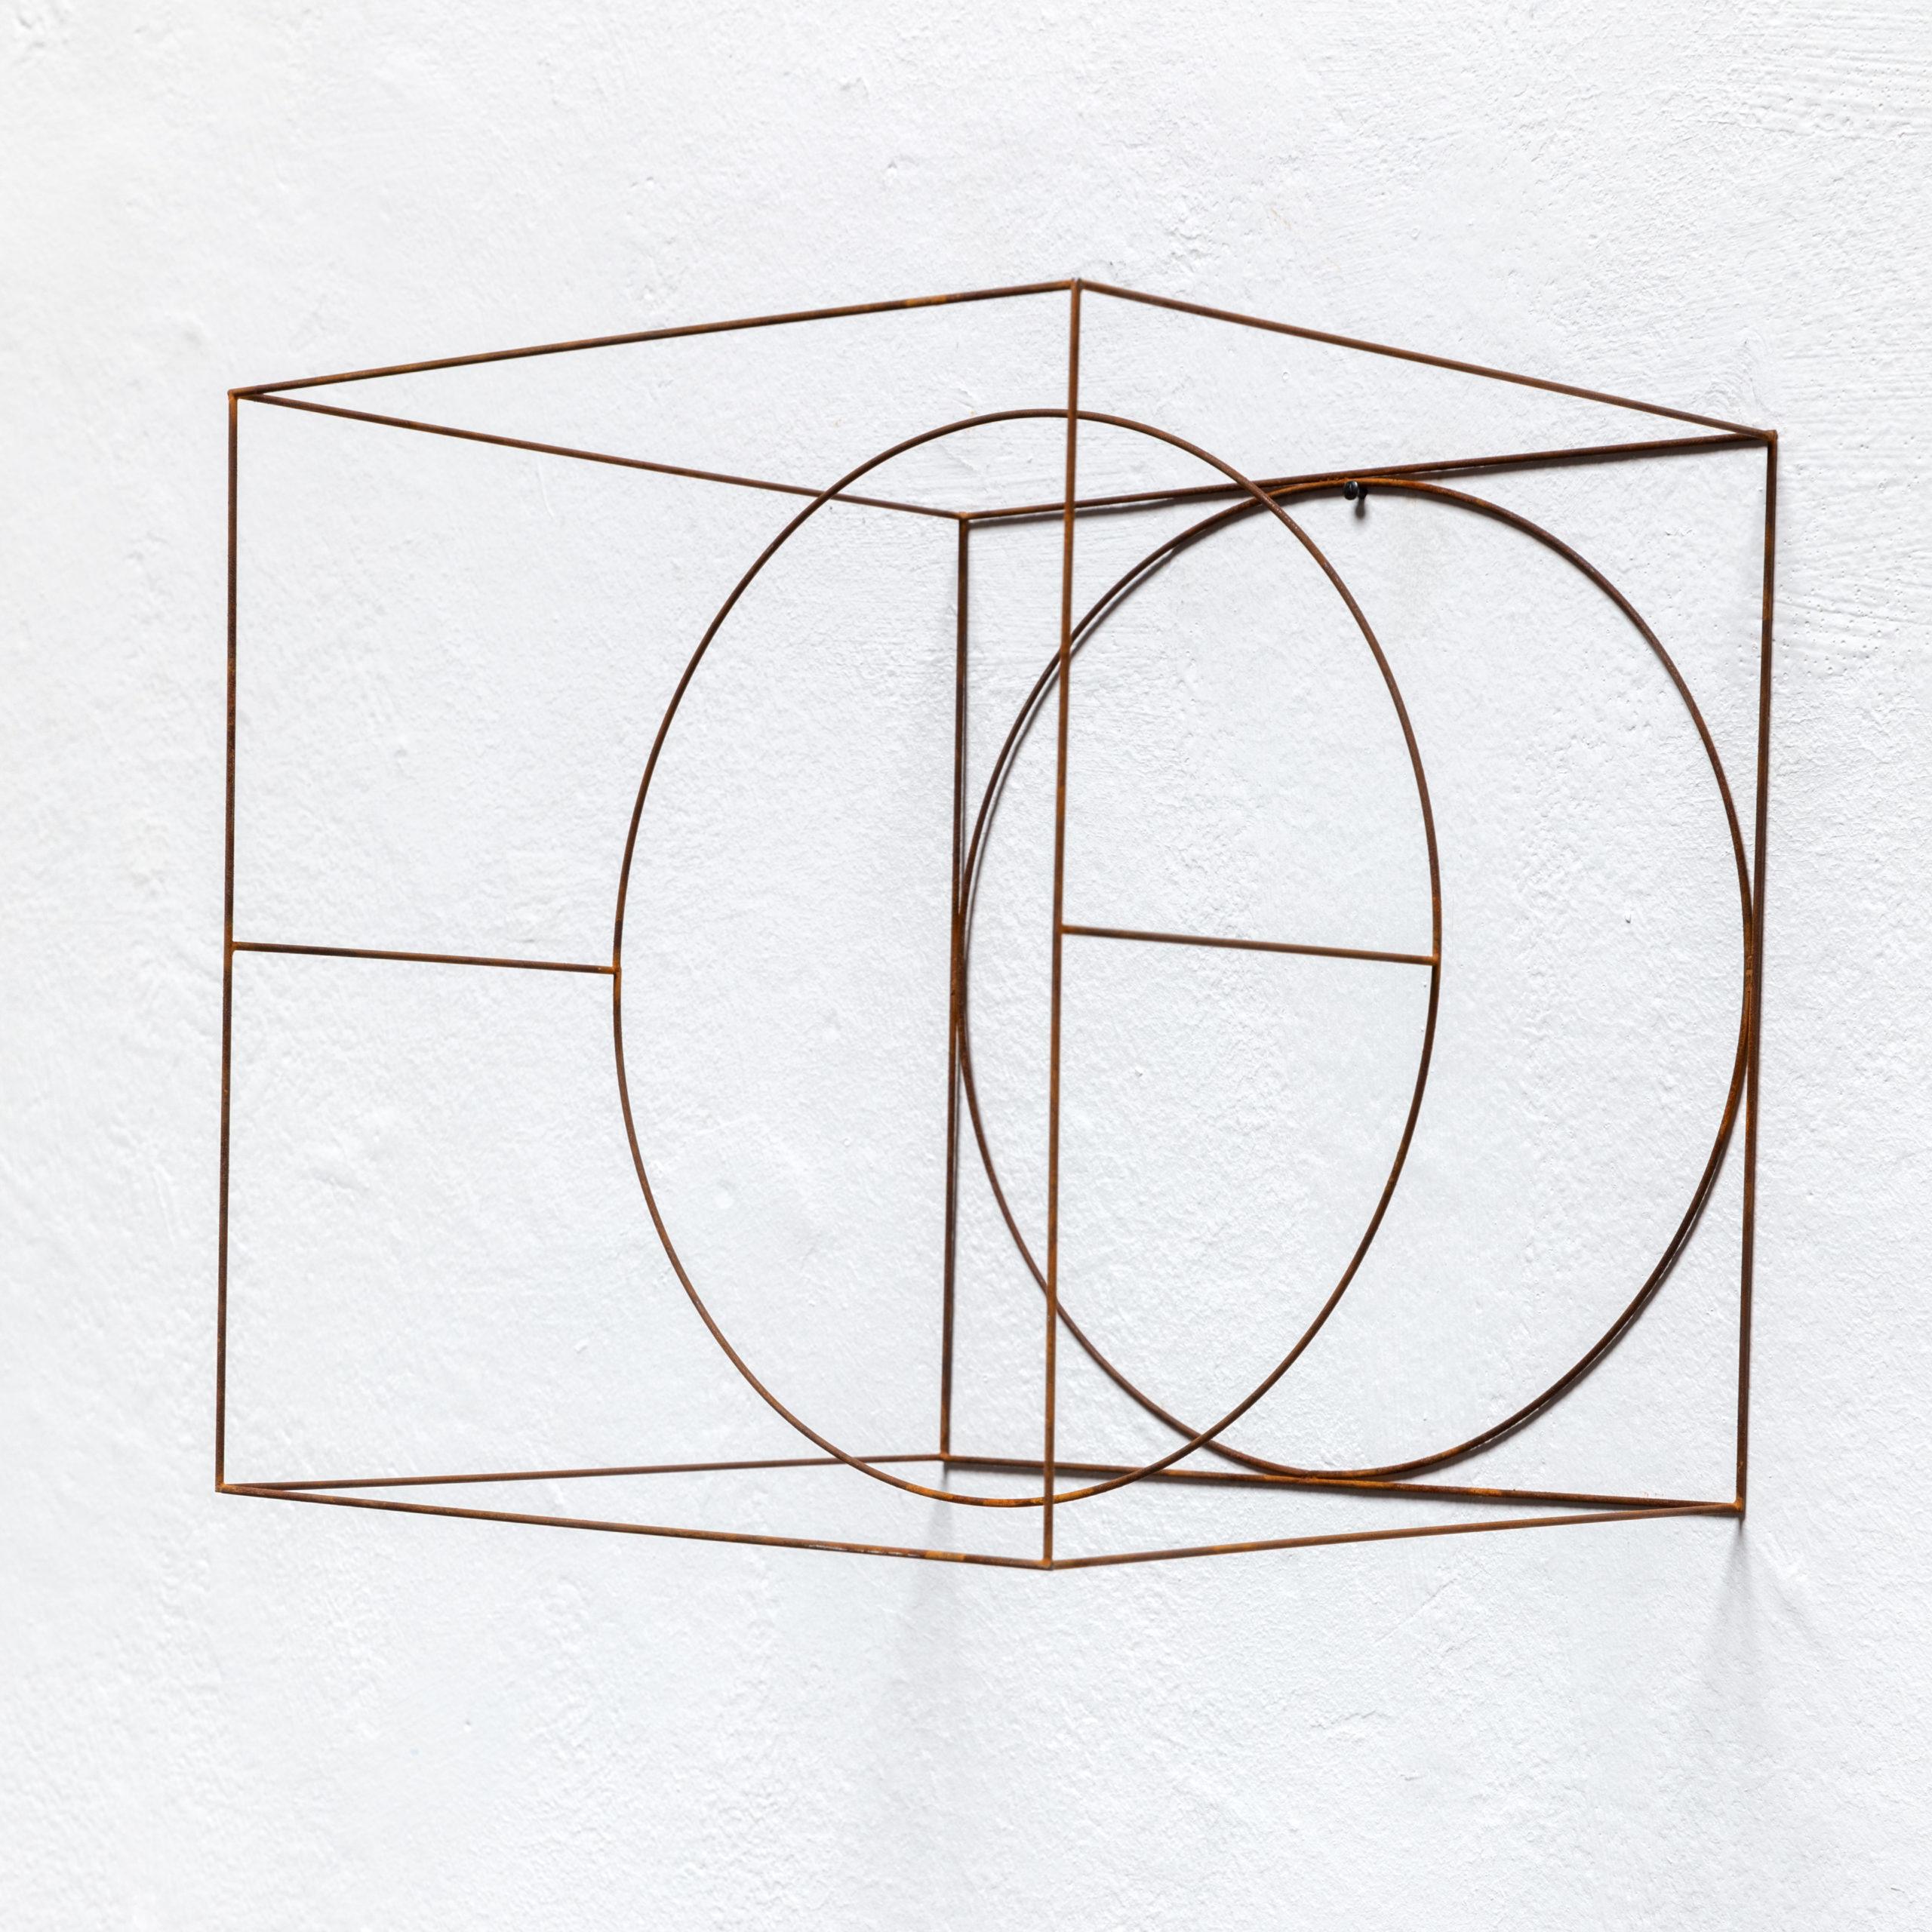 ANNE ROSE REGENBOOG, Cube Objects, 2018, Metall, 20x20x20cm